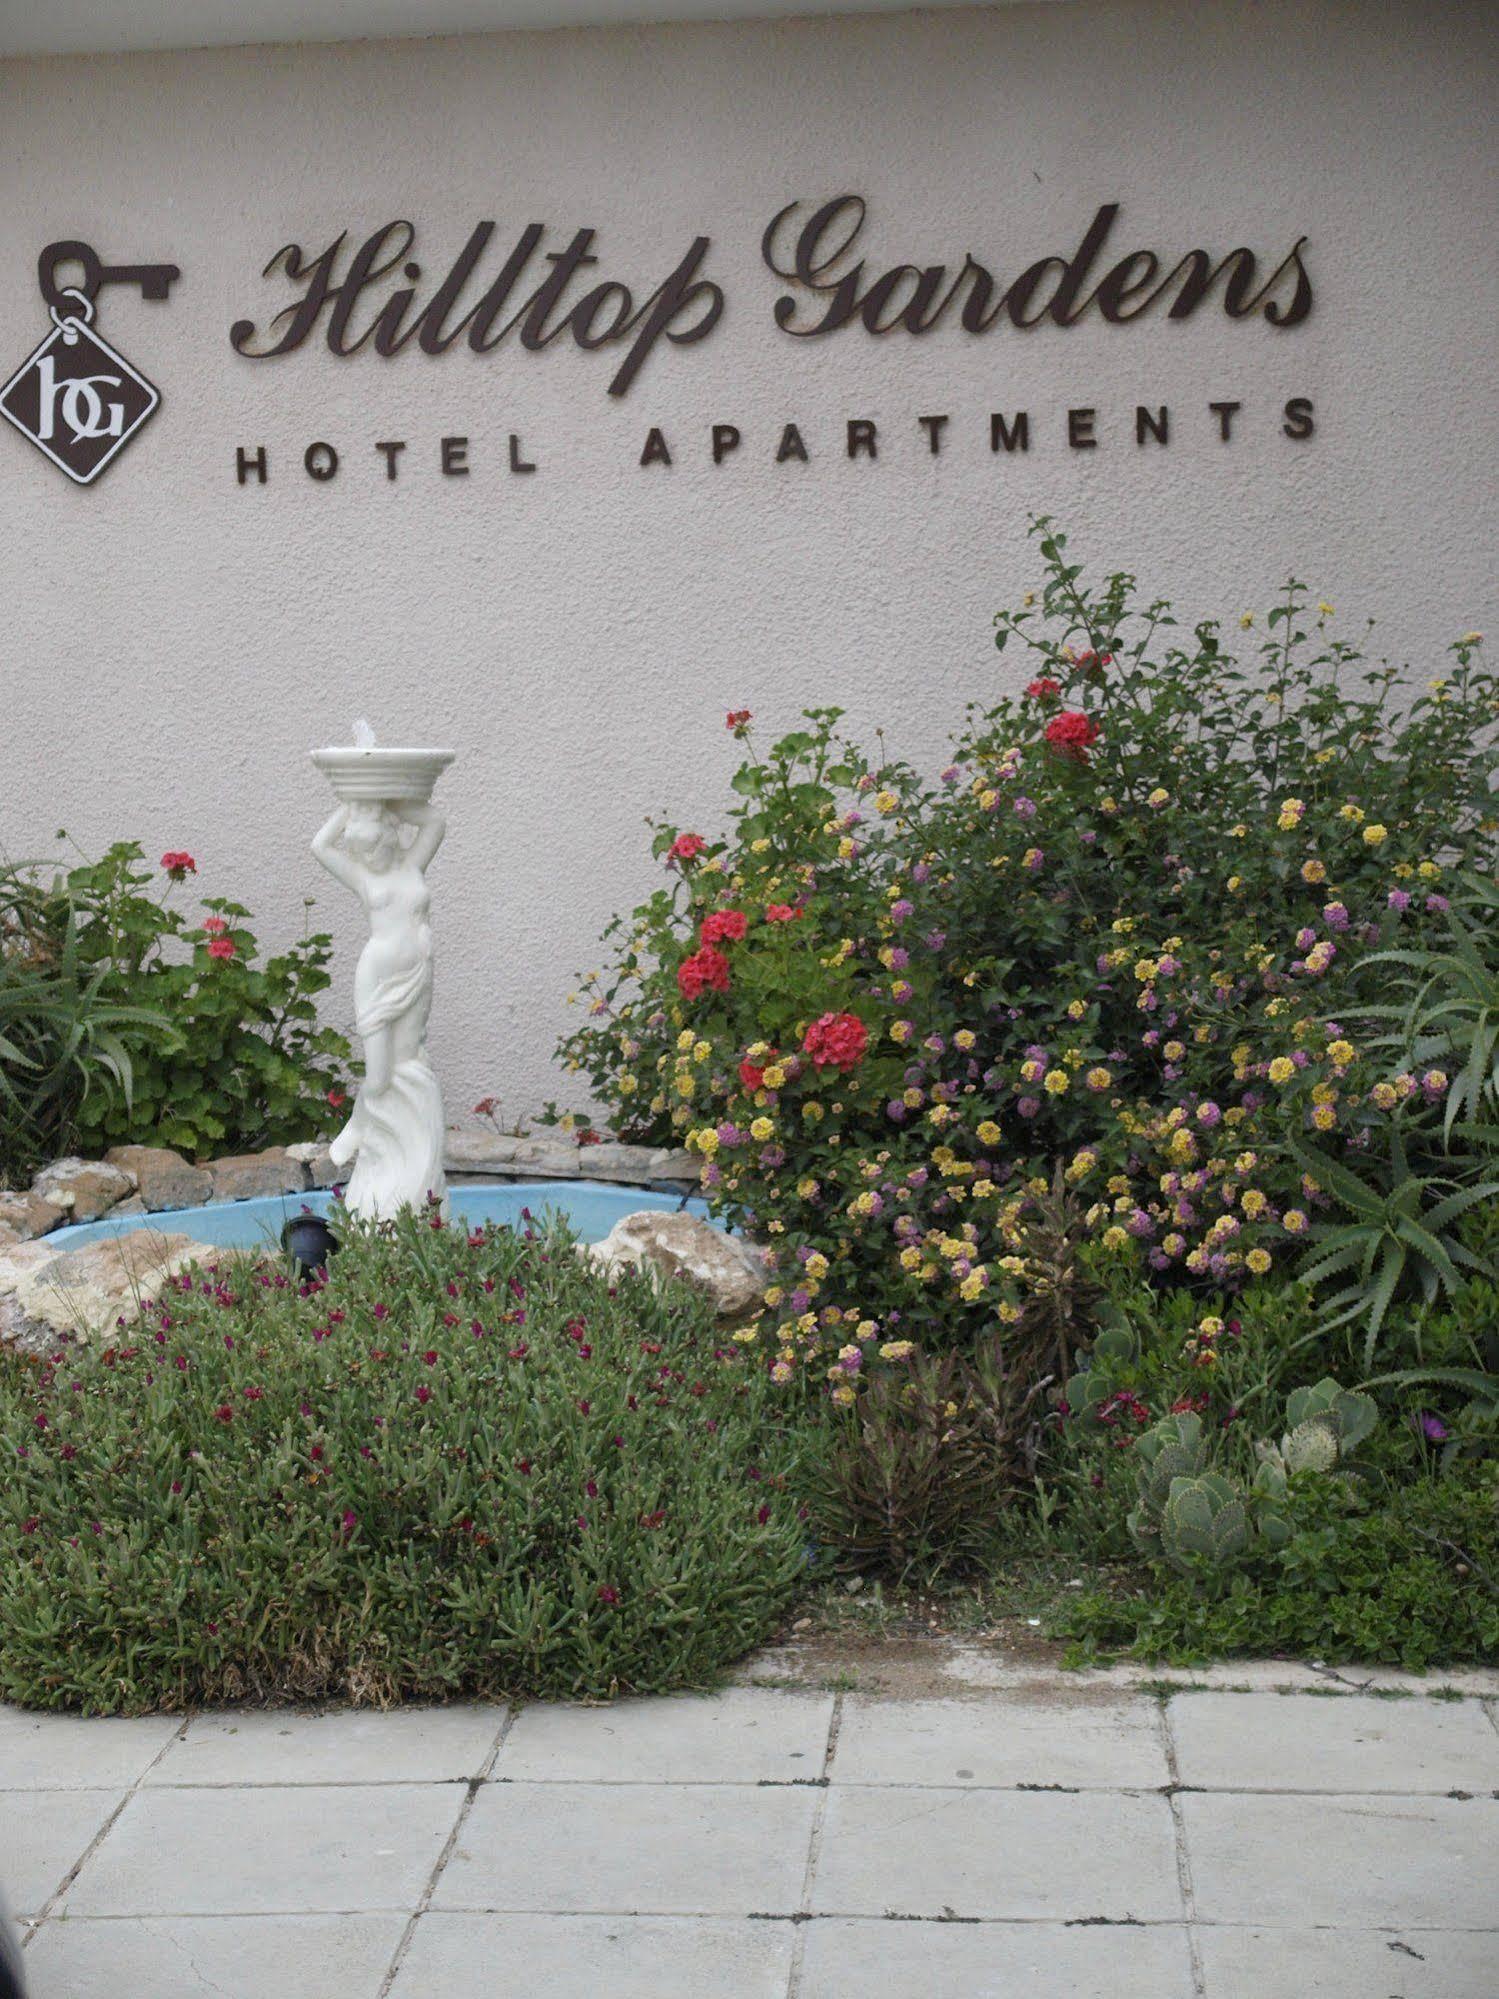 Hilltop Gardens Hotel Apartments